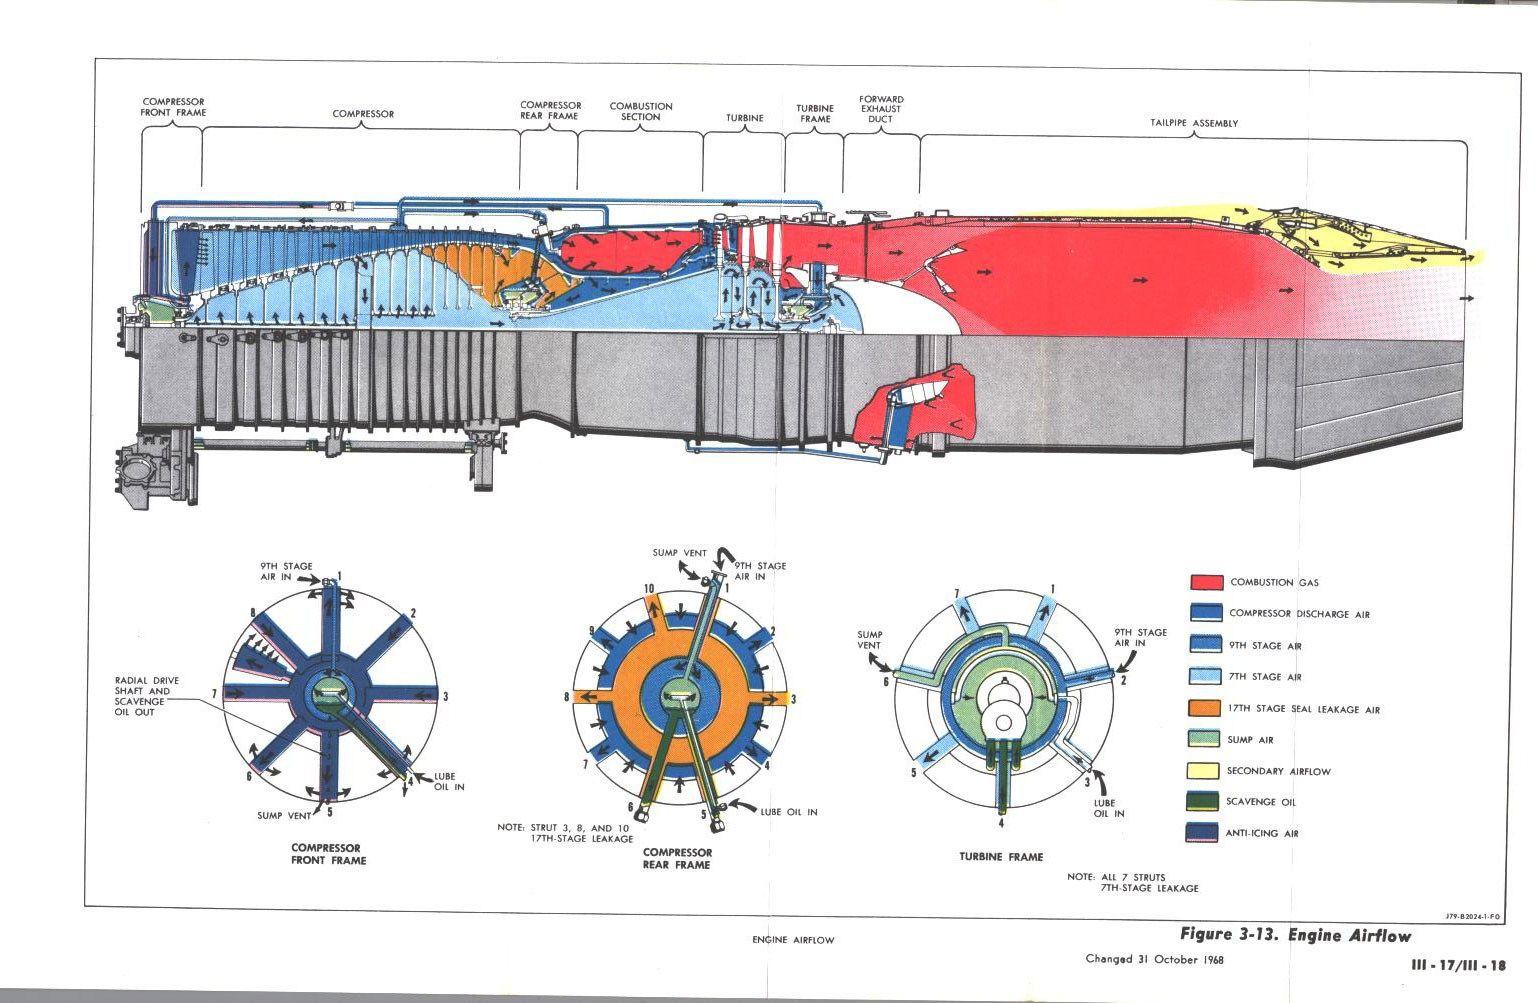 General Electric J79 Turbine Engine, Gas Turbine, Rc Motors, Jumbo Jet,  Aircraft